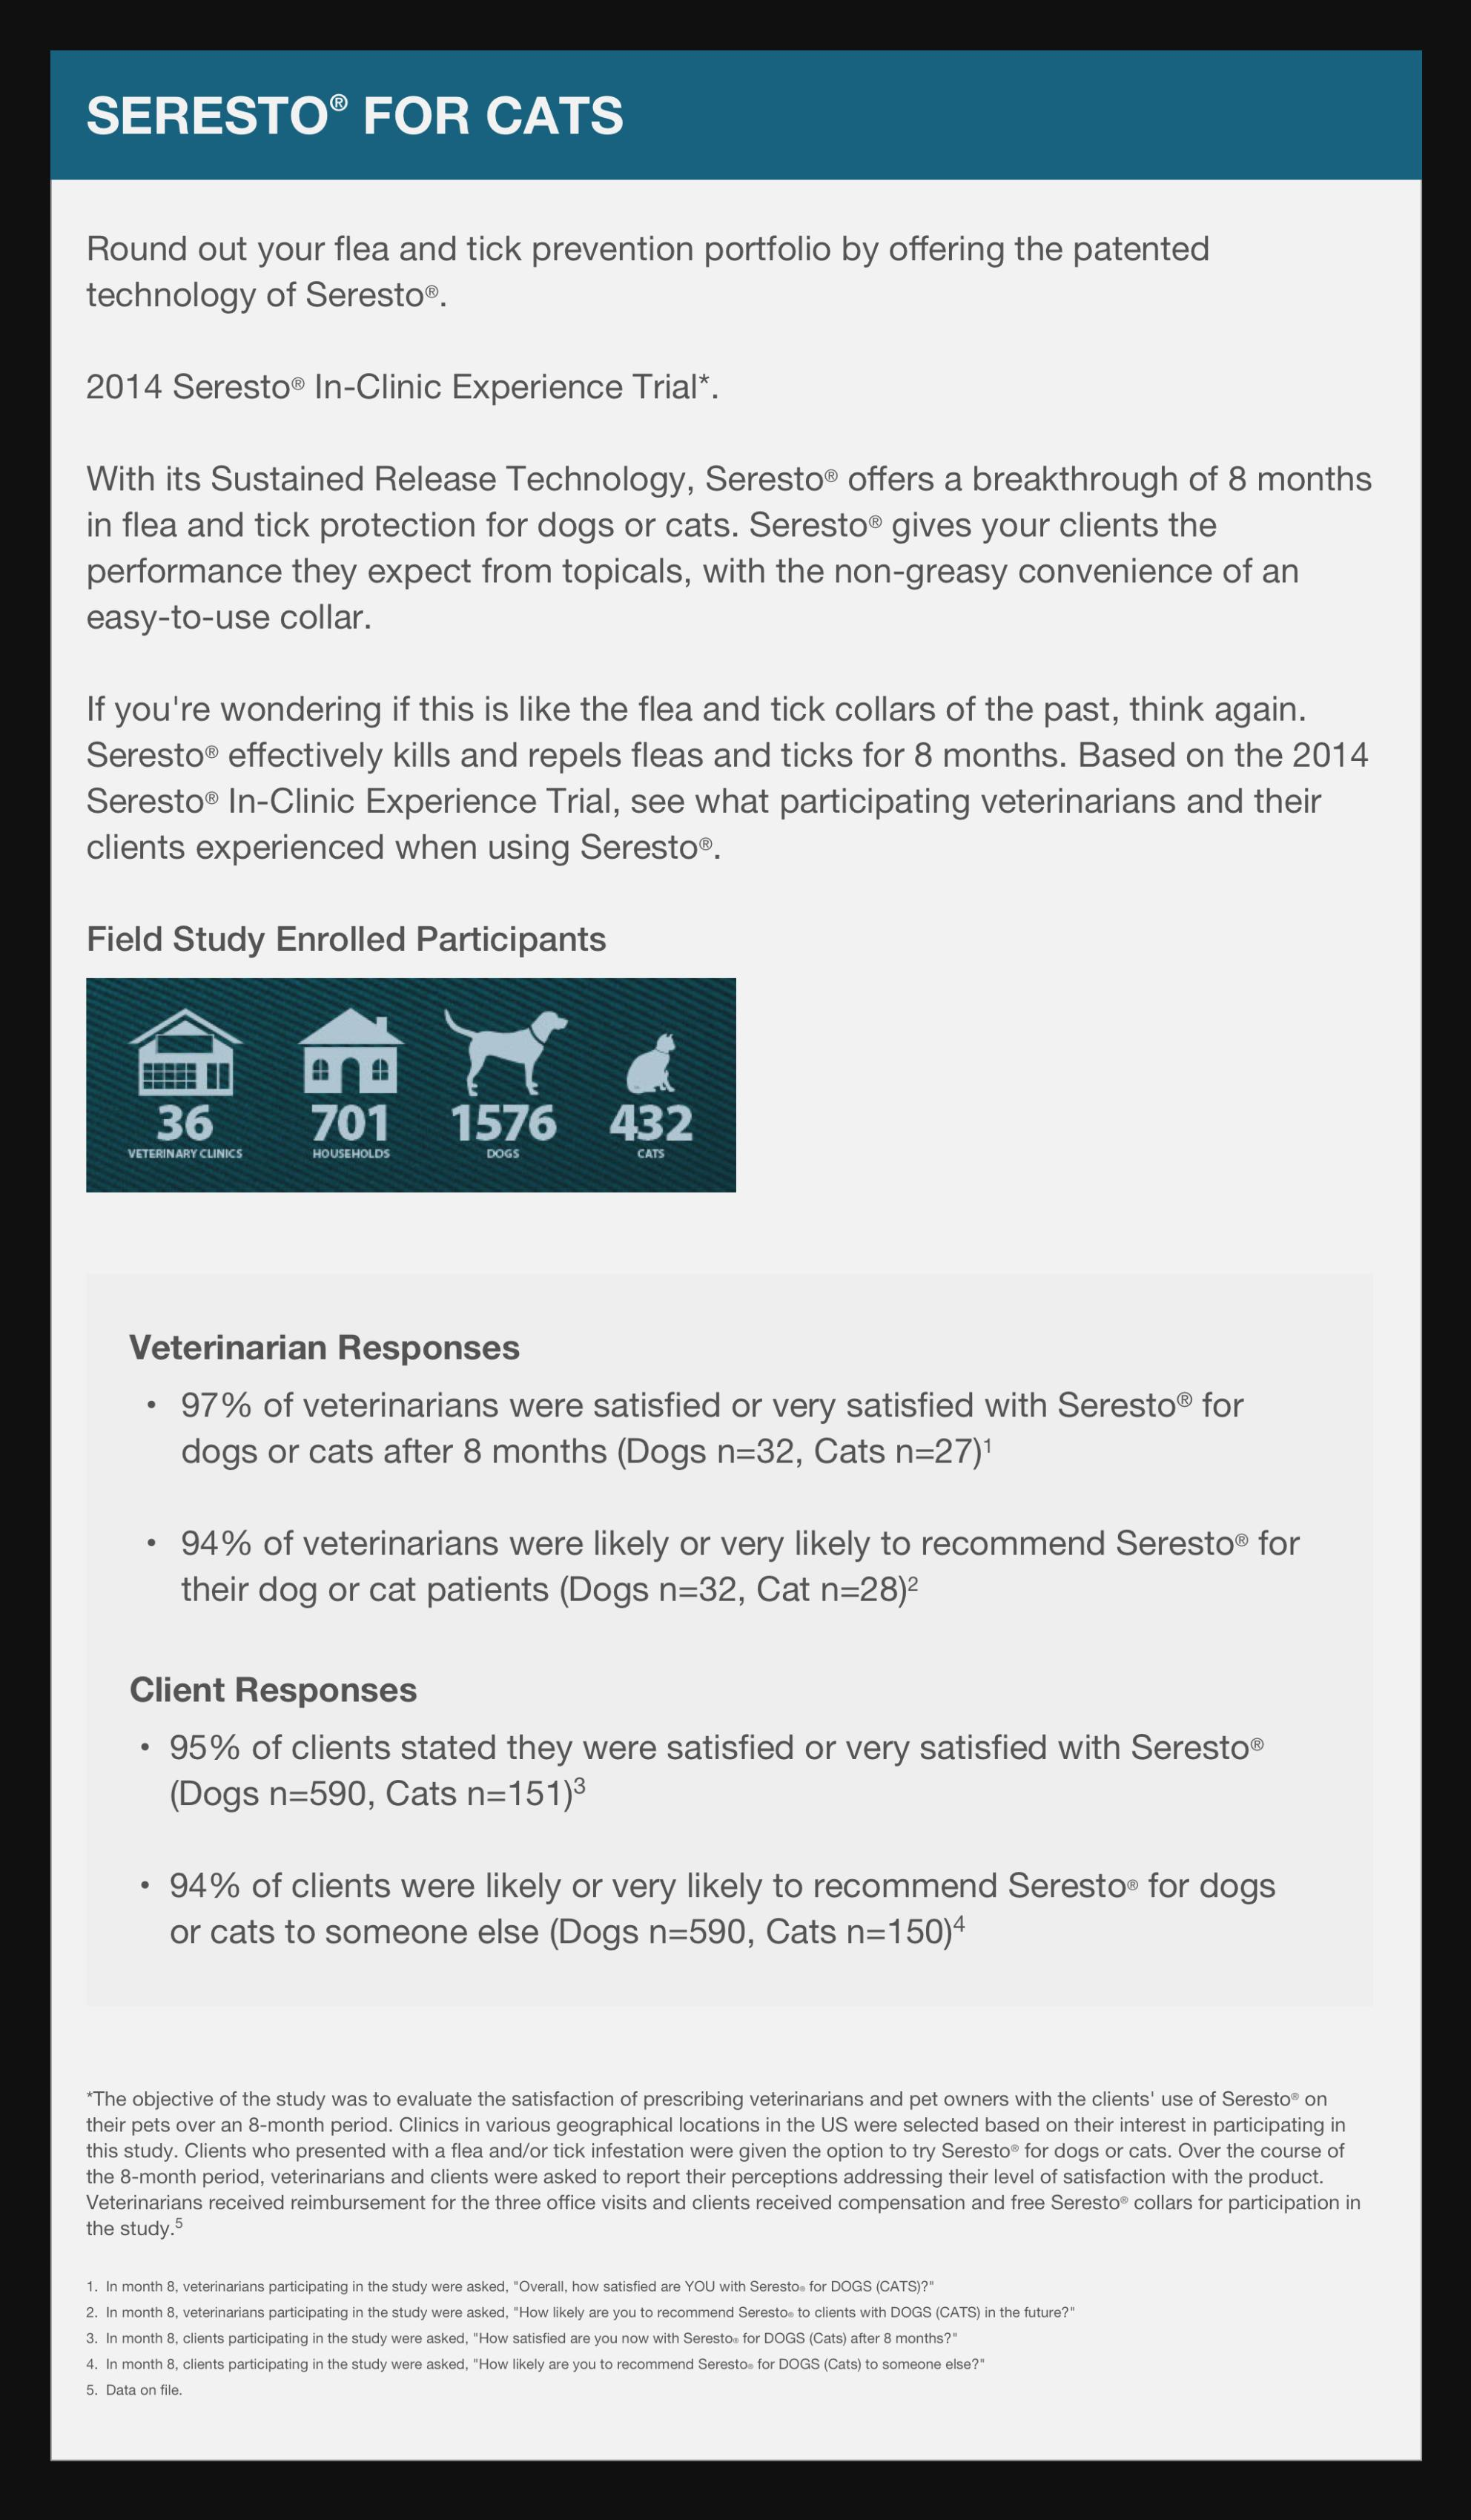 Bayer Seresto Rebate Form 2017